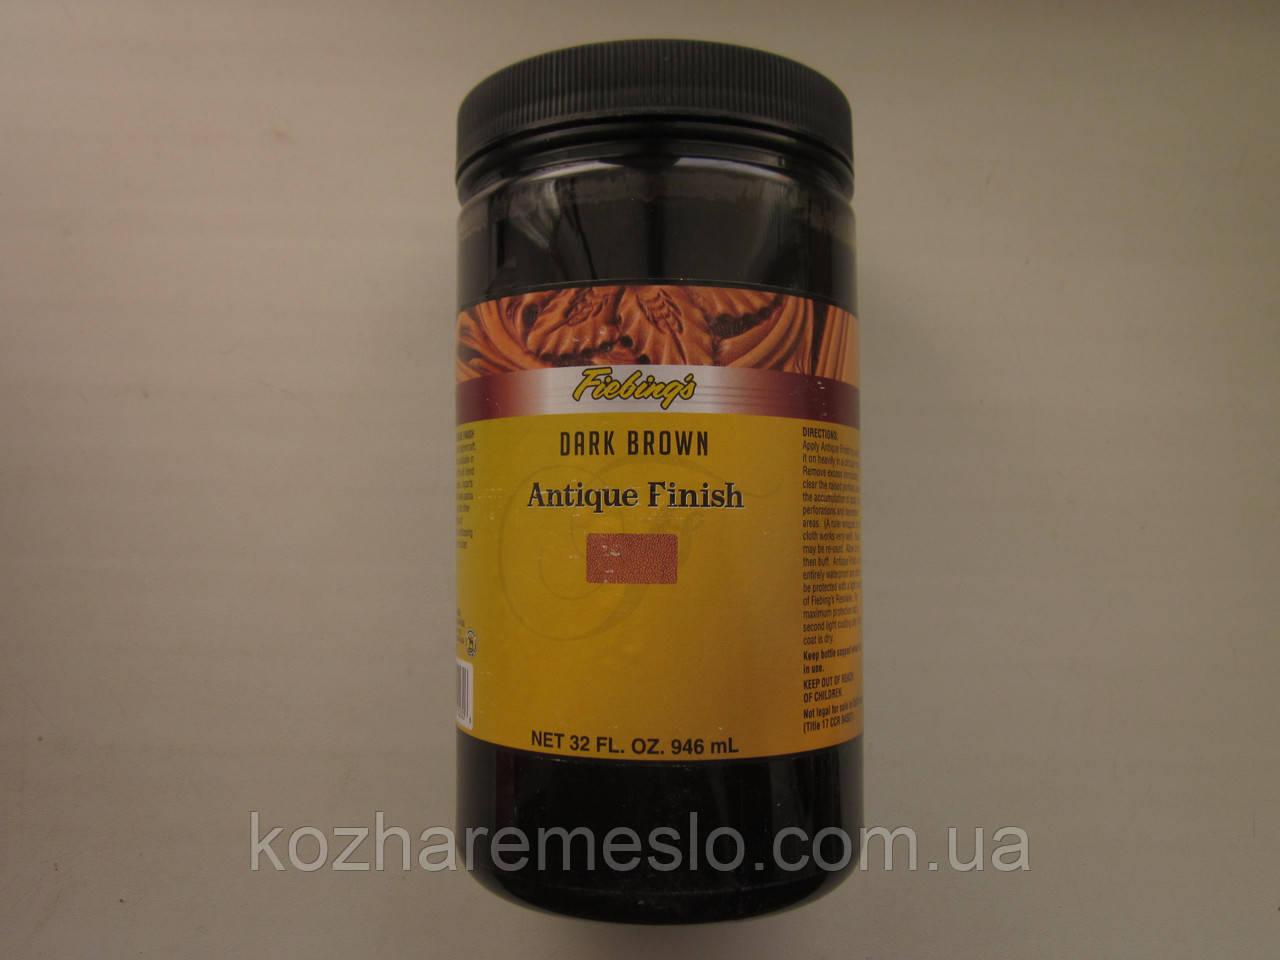 Антик - финиш FIEBING'S для кожи 30 гр тёмно - коричневый (не фирменная упаковка)